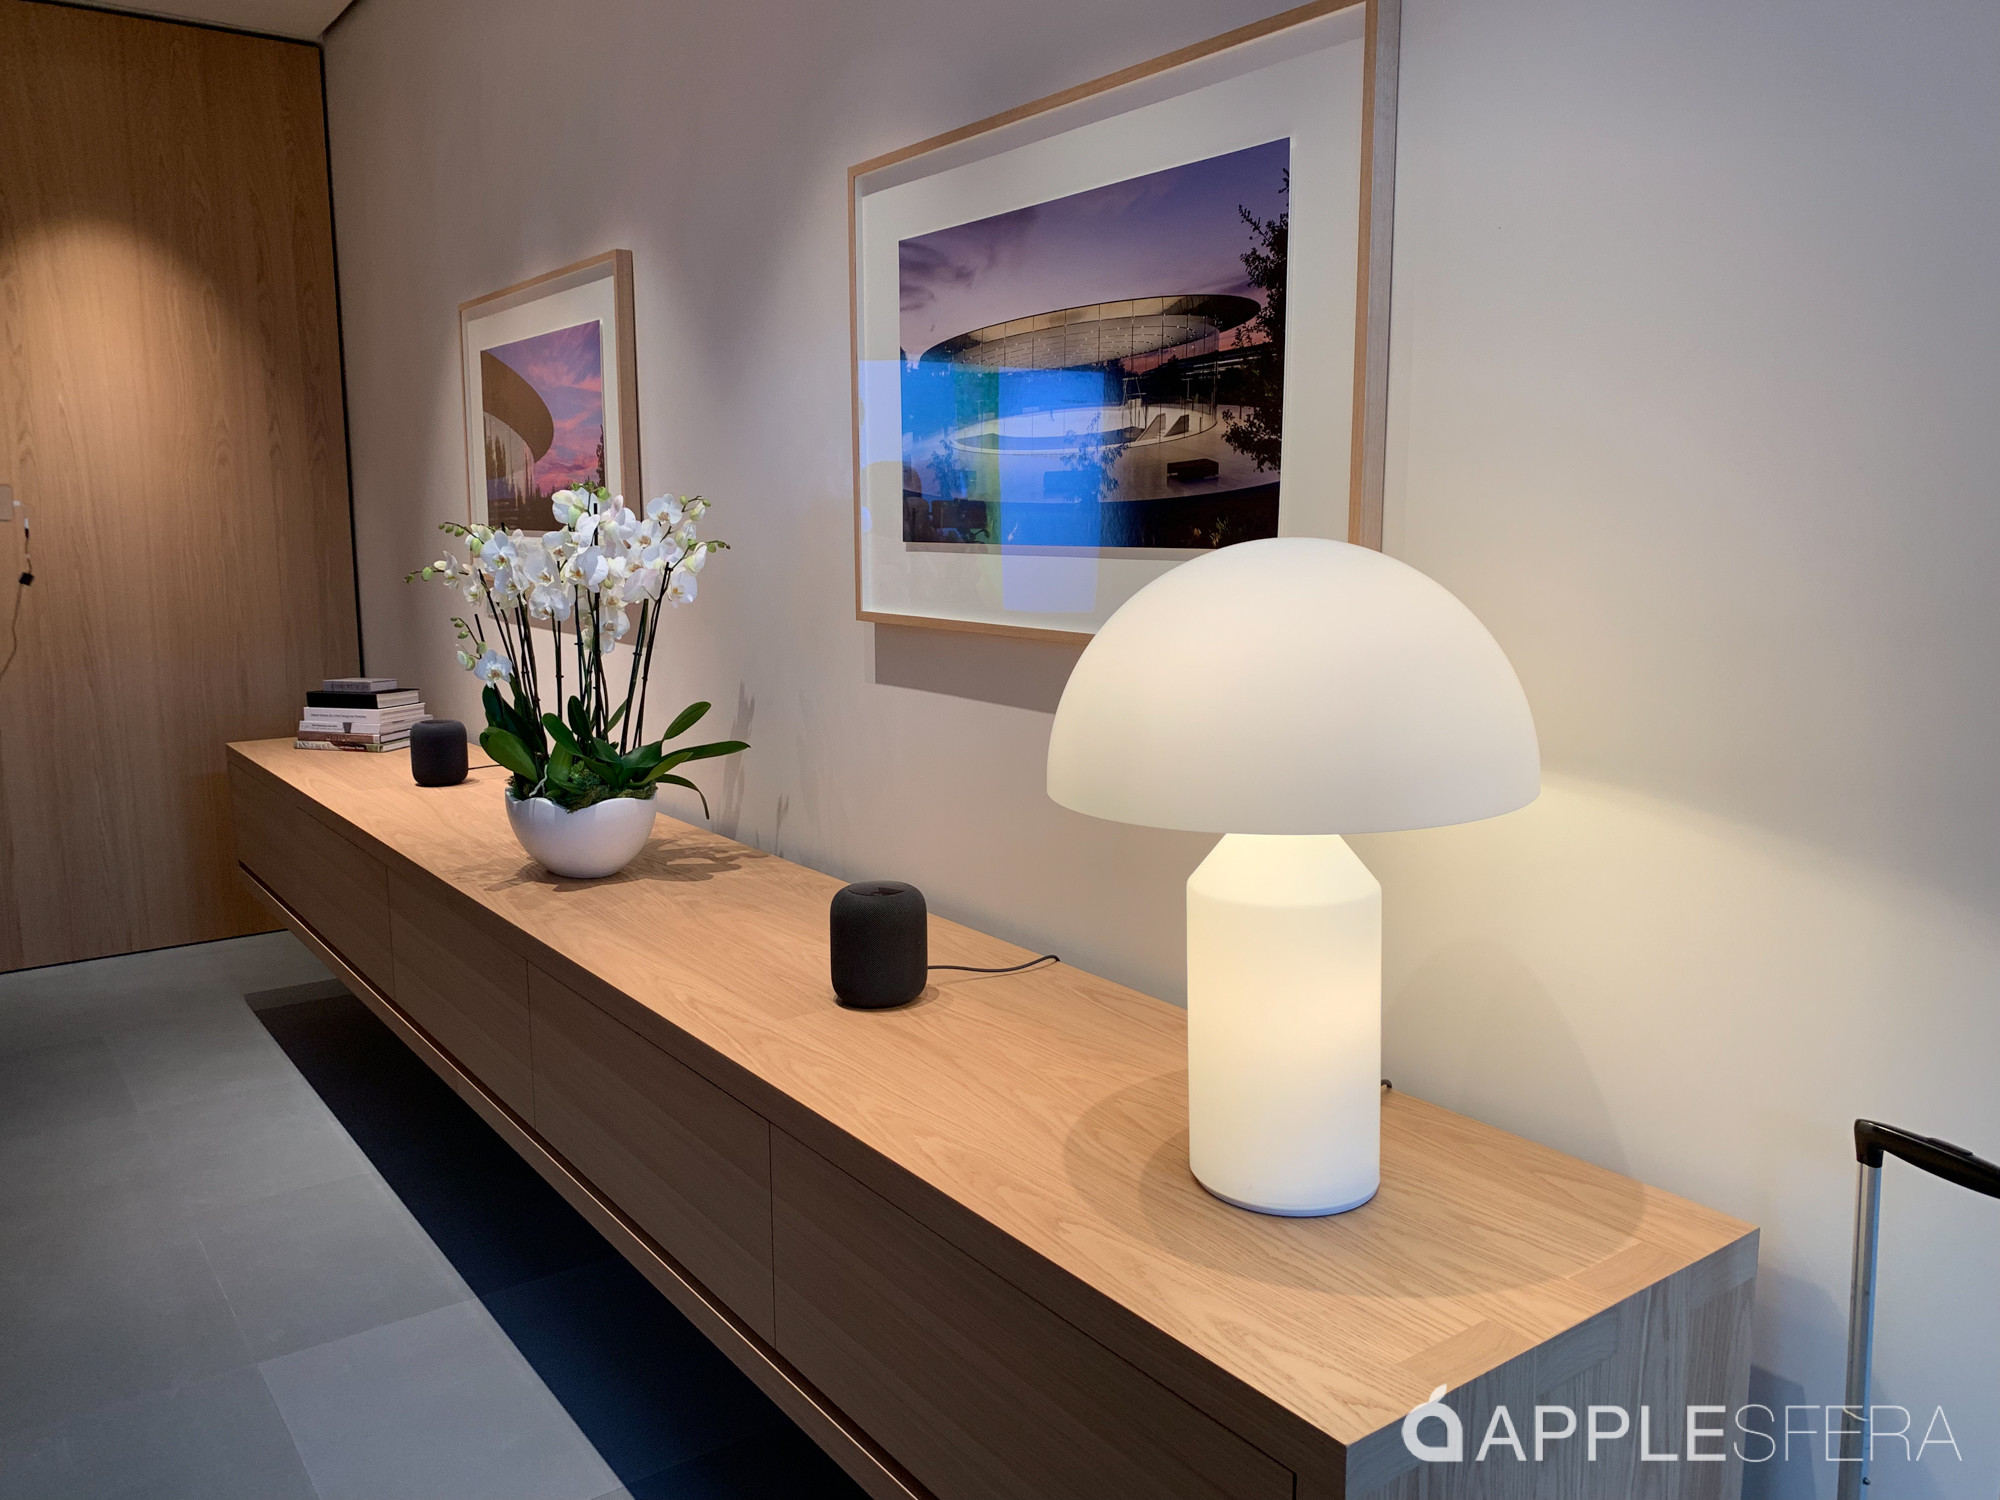 Foto de Apple Store Passeig de Gràcia (13/28)